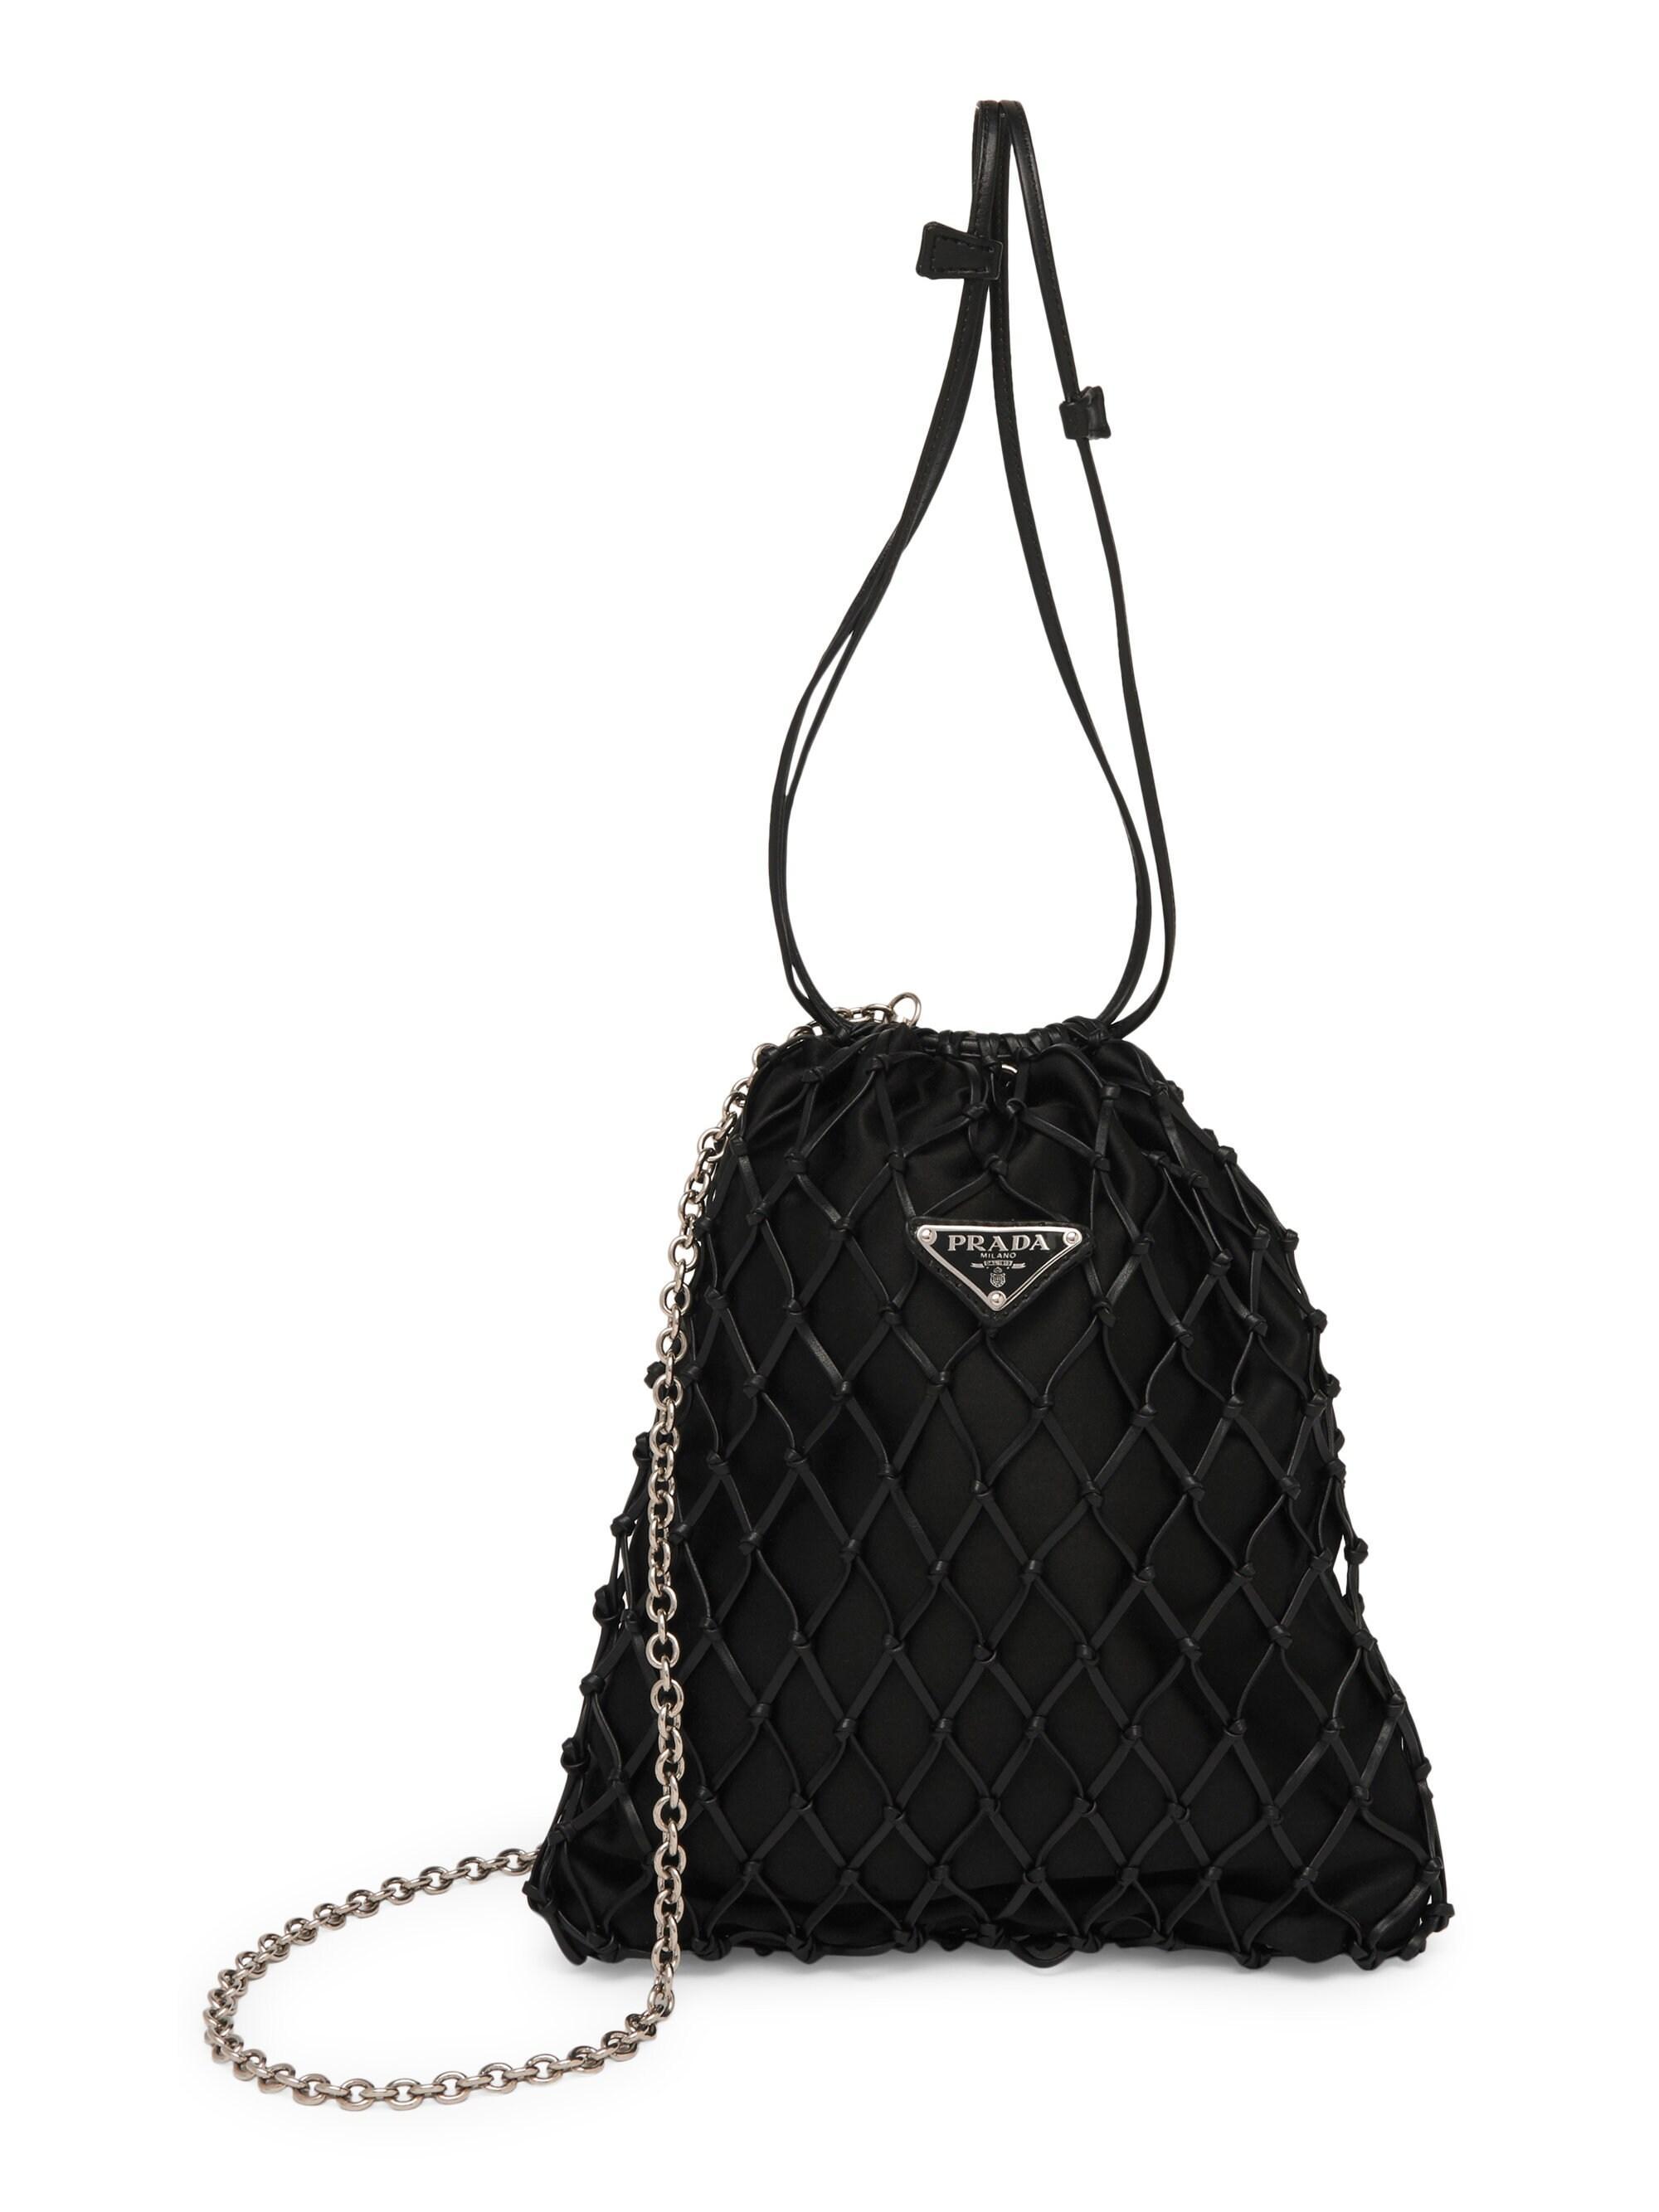 50a8310c3fcc Prada Women's Silk Net Bag - Orange in Black - Lyst